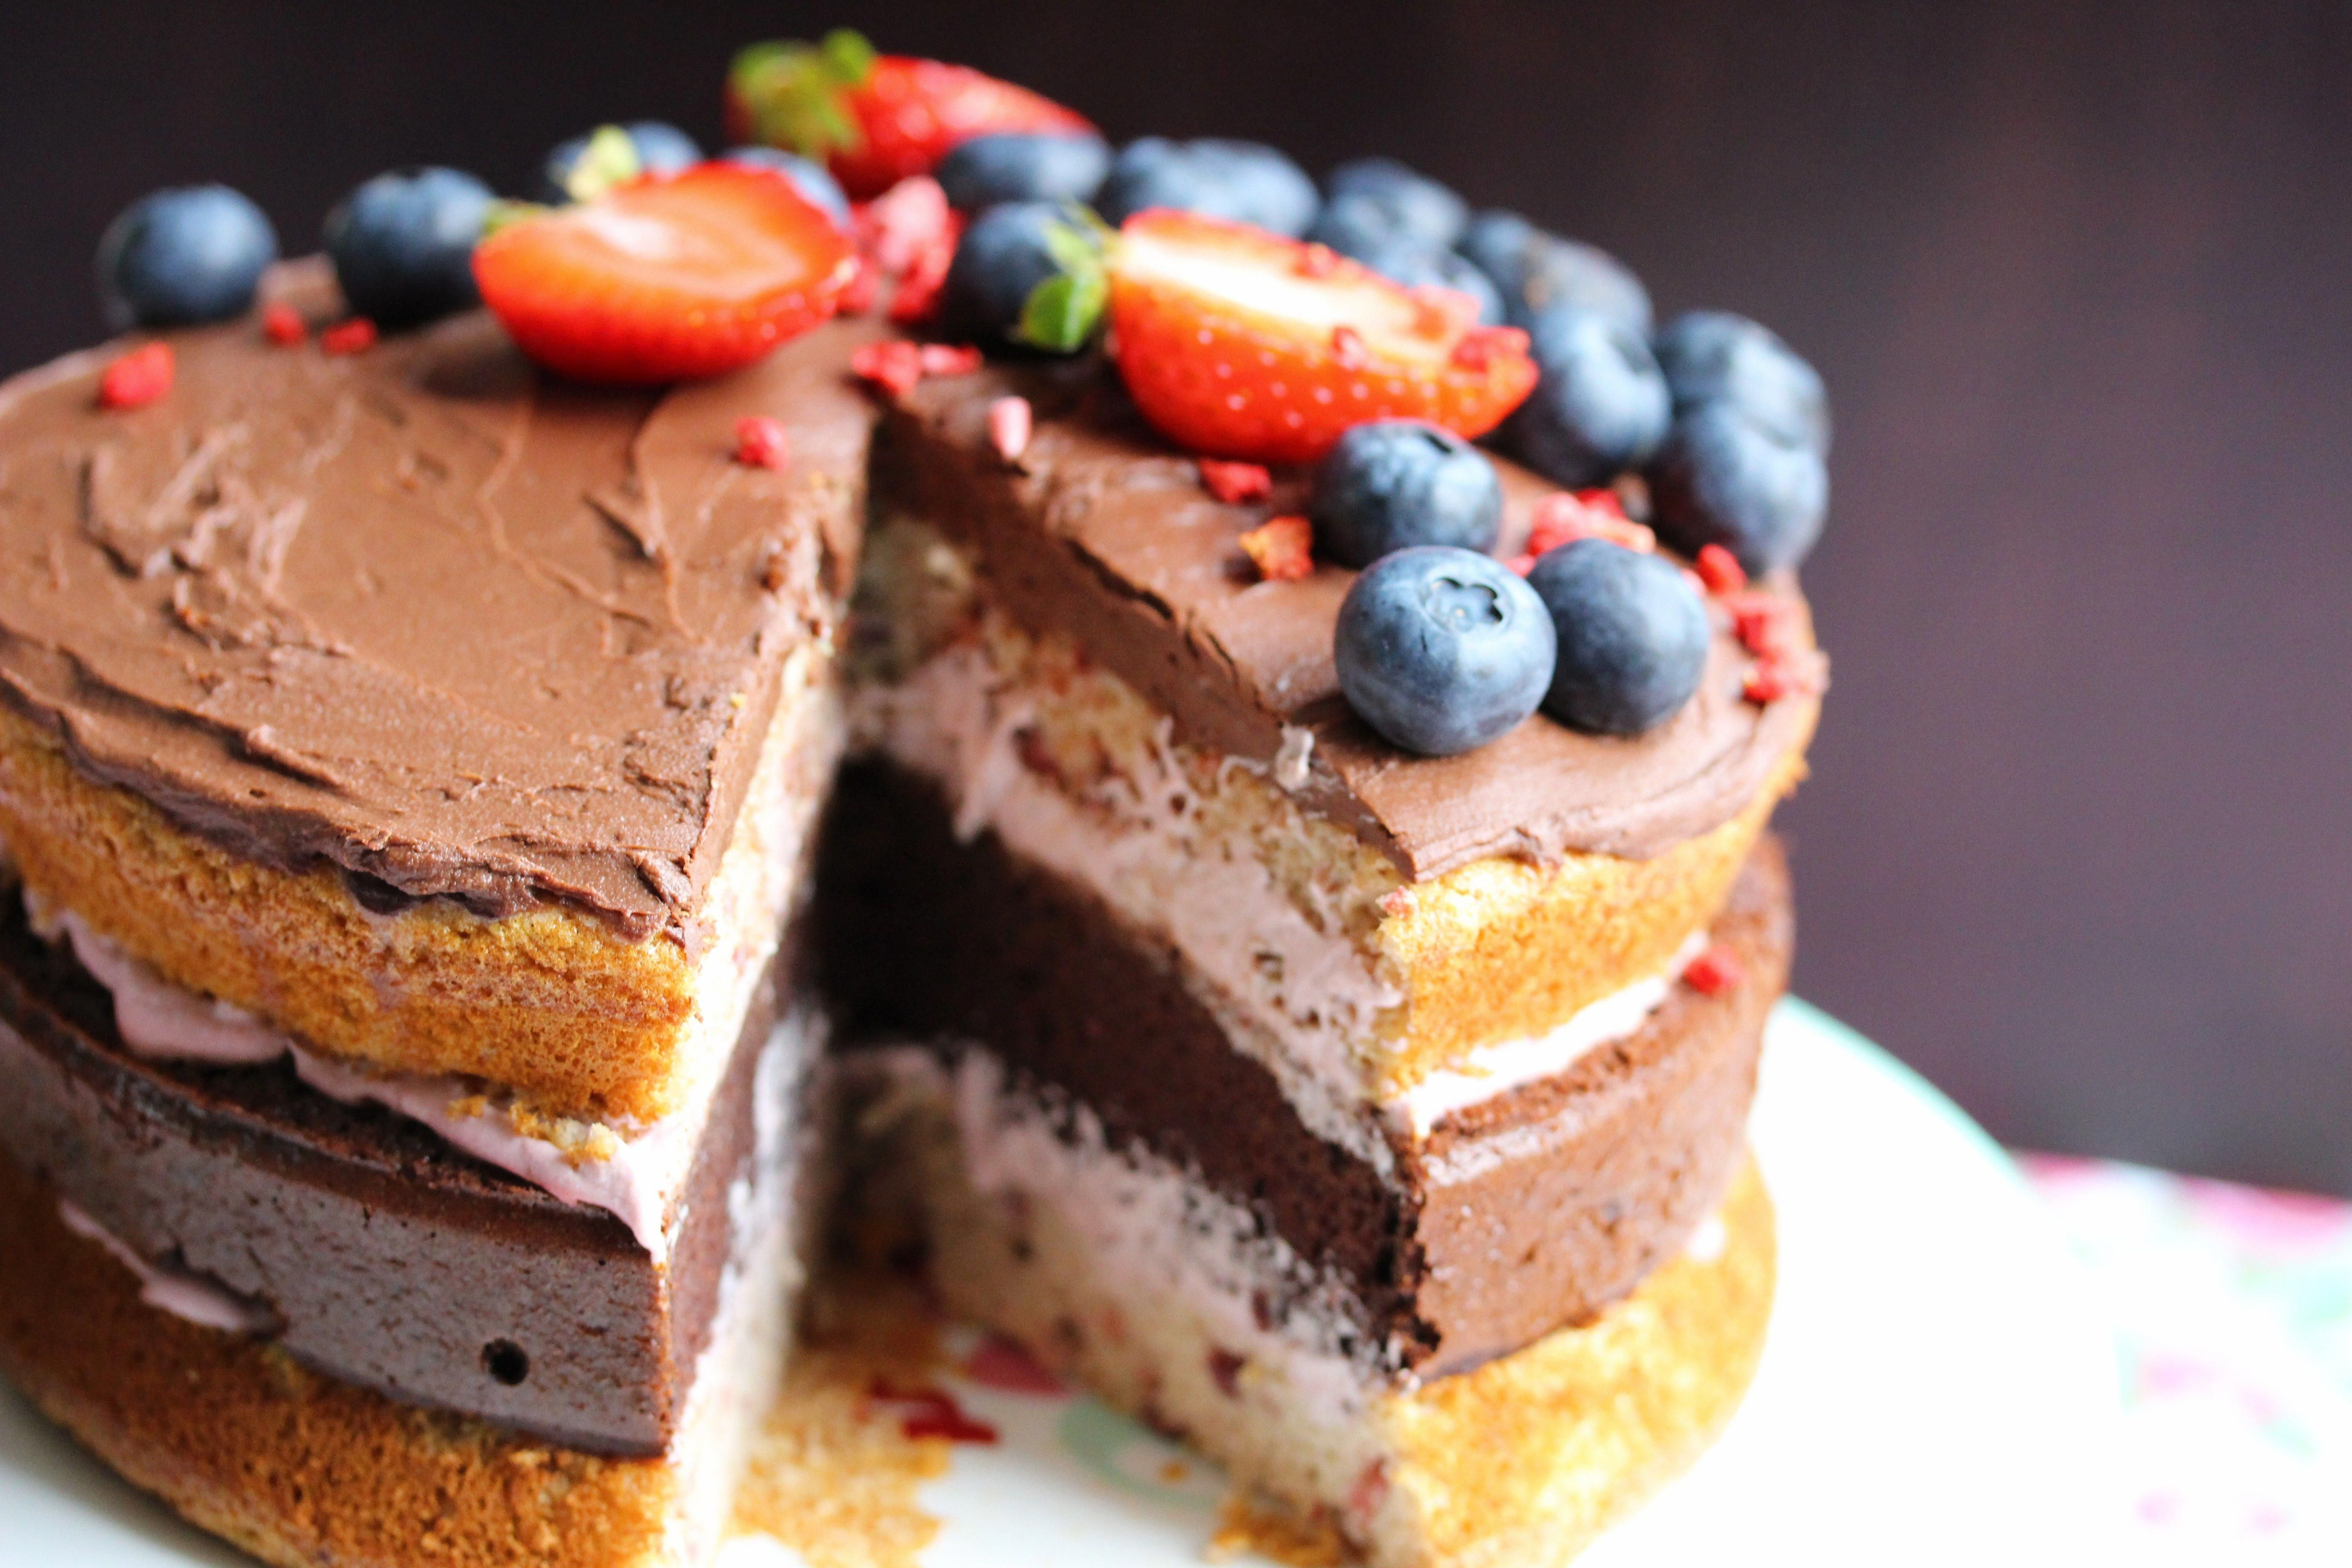 25 Creative Photo Of Free Pictures Birthday Cakes Diabetes CakeForBirthday